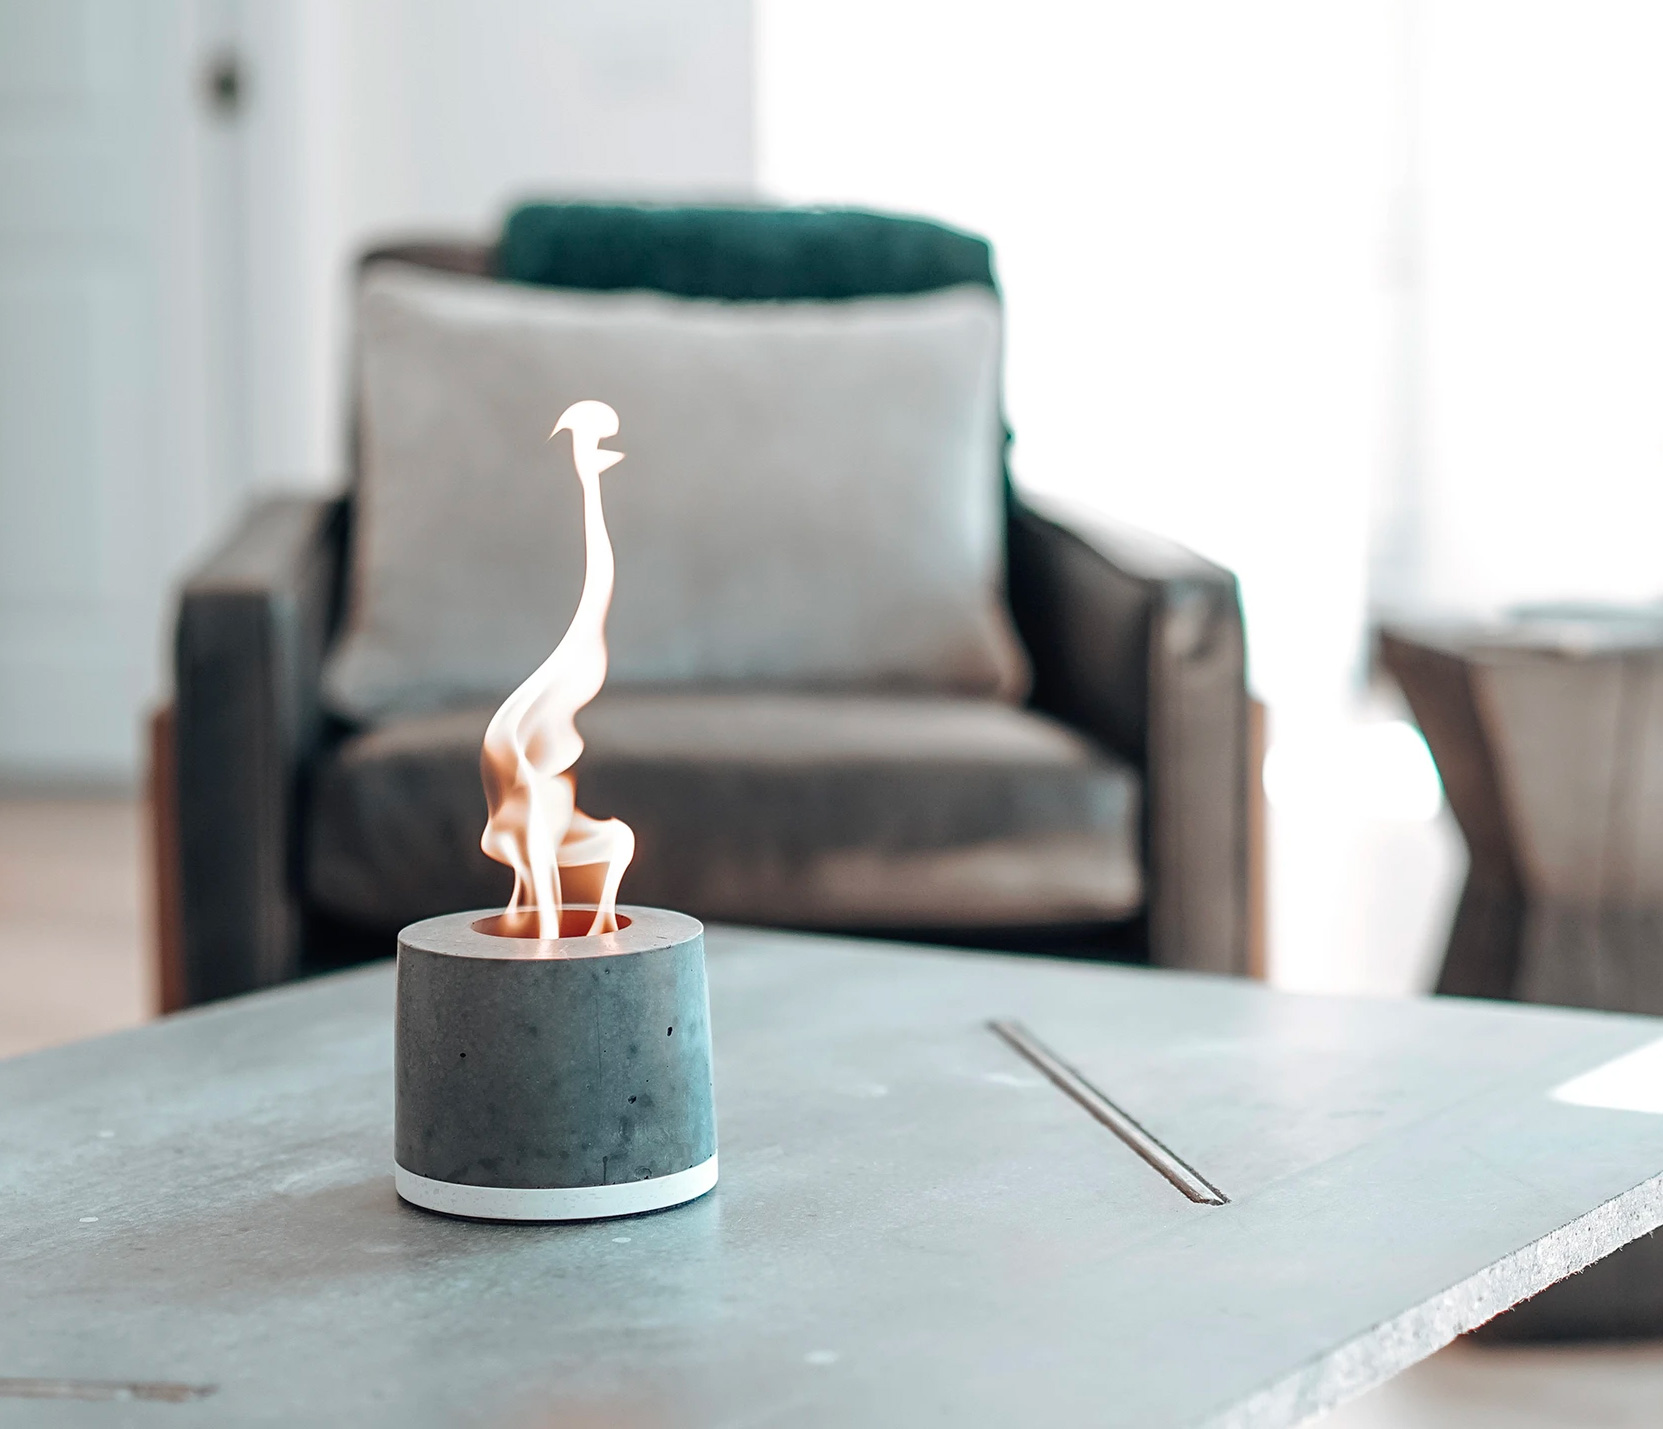 Make S'Mores Indoors with FLÎKR Fire2 at werd.com